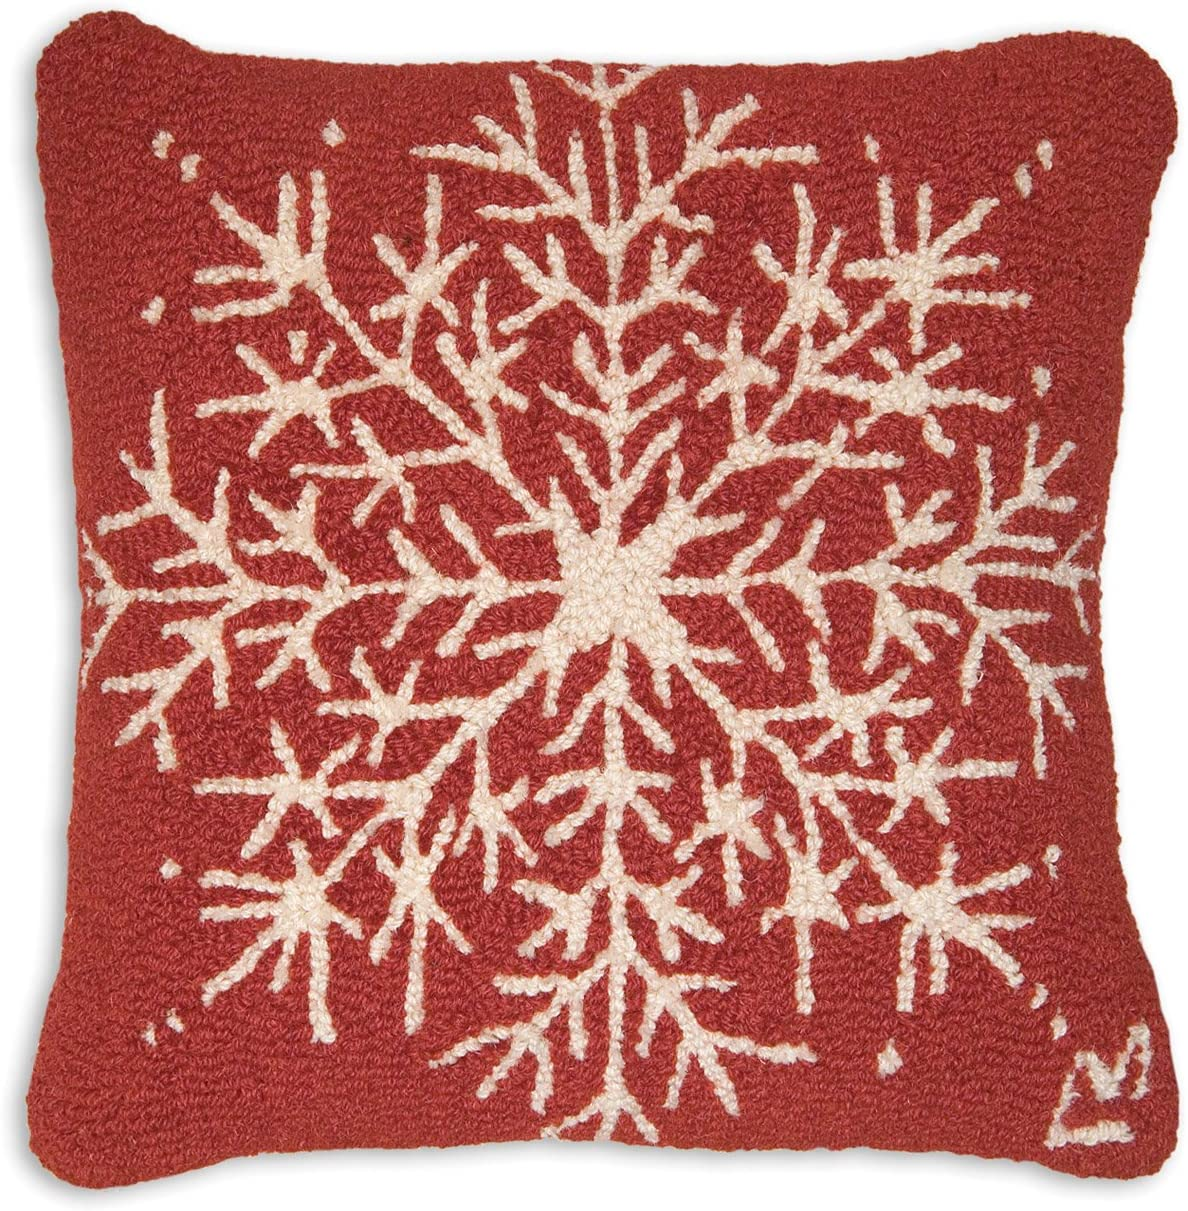 Chandler 4 Corners Artist-Designed Snowflake Hand-Hooked Wool Decorative Throw Pillow 18 x 18